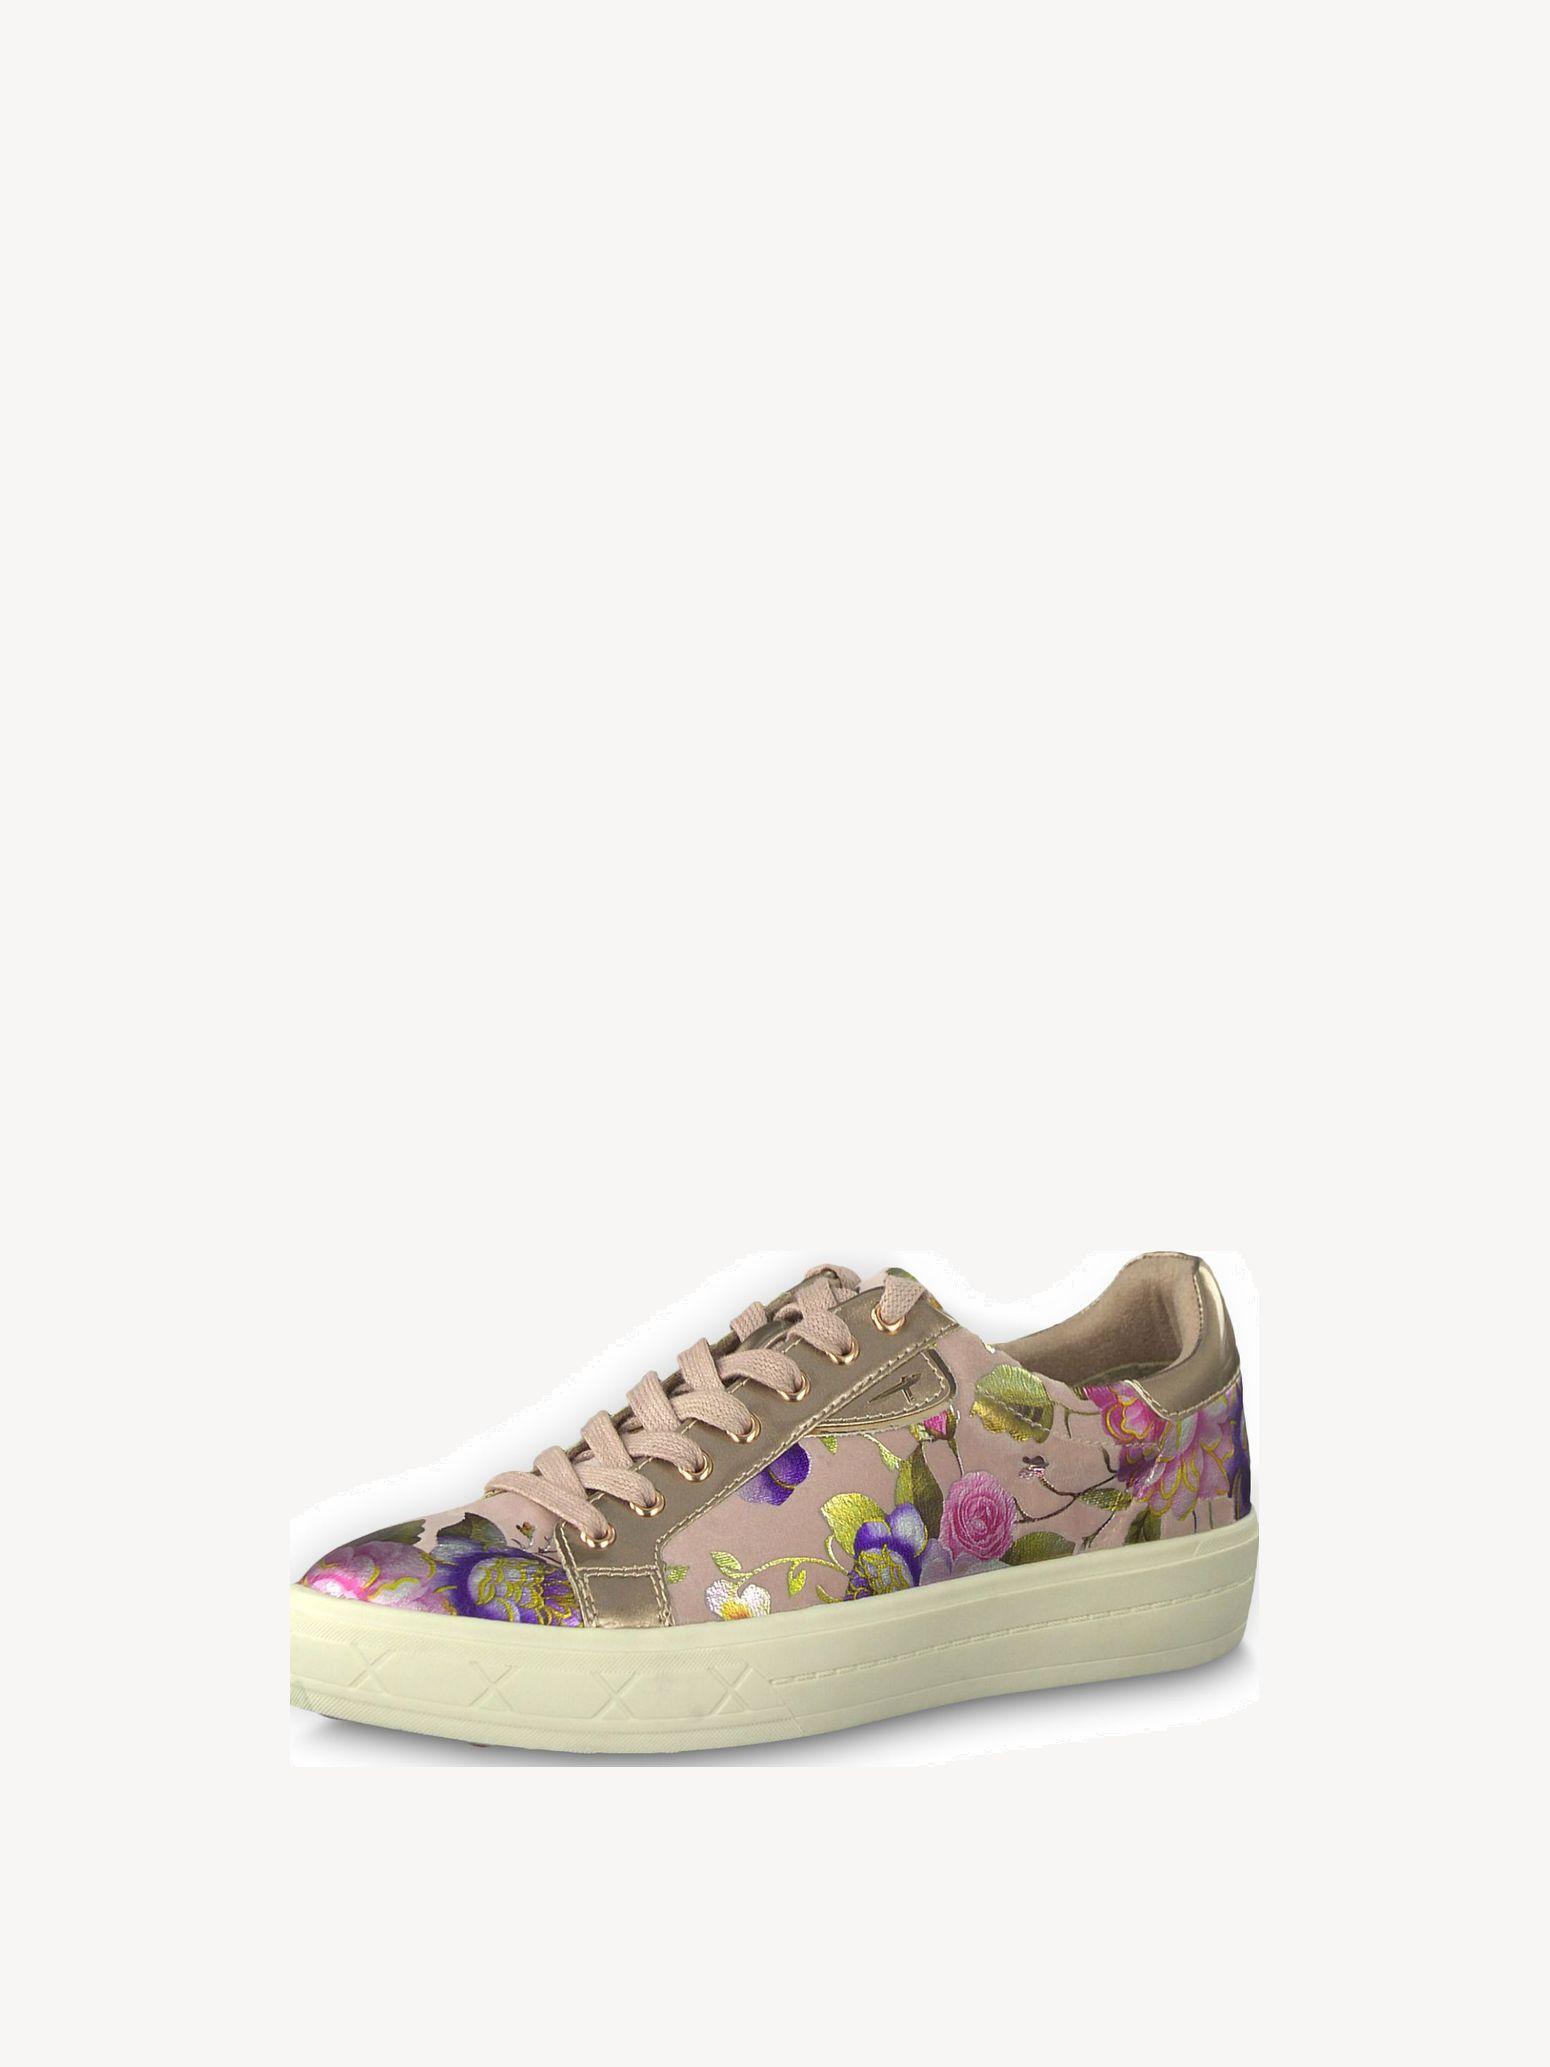 huge discount eea02 7878a Marras Low shoes